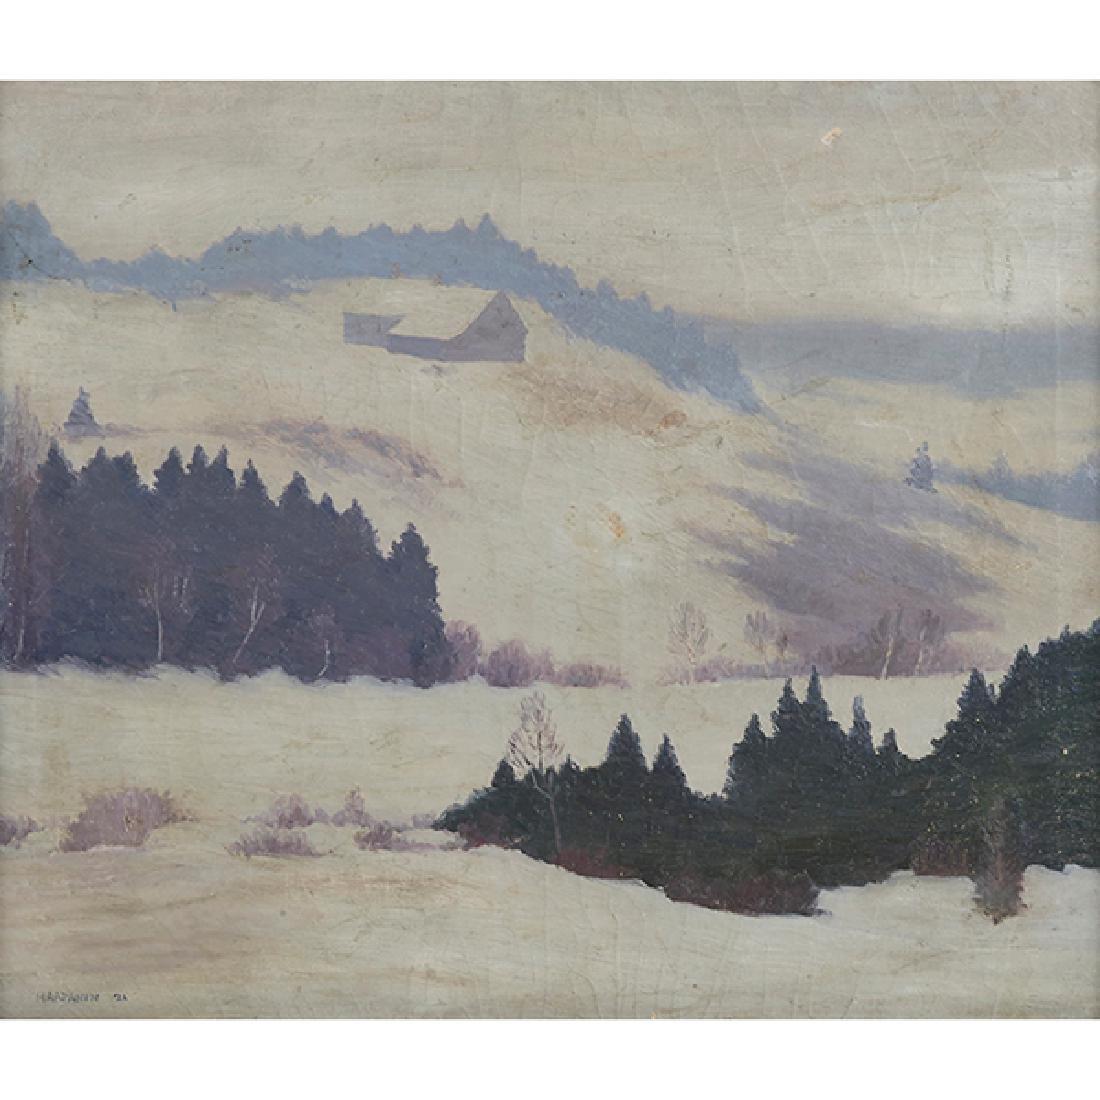 John Haapanen, (American, 1891-1968), Maine Snowy